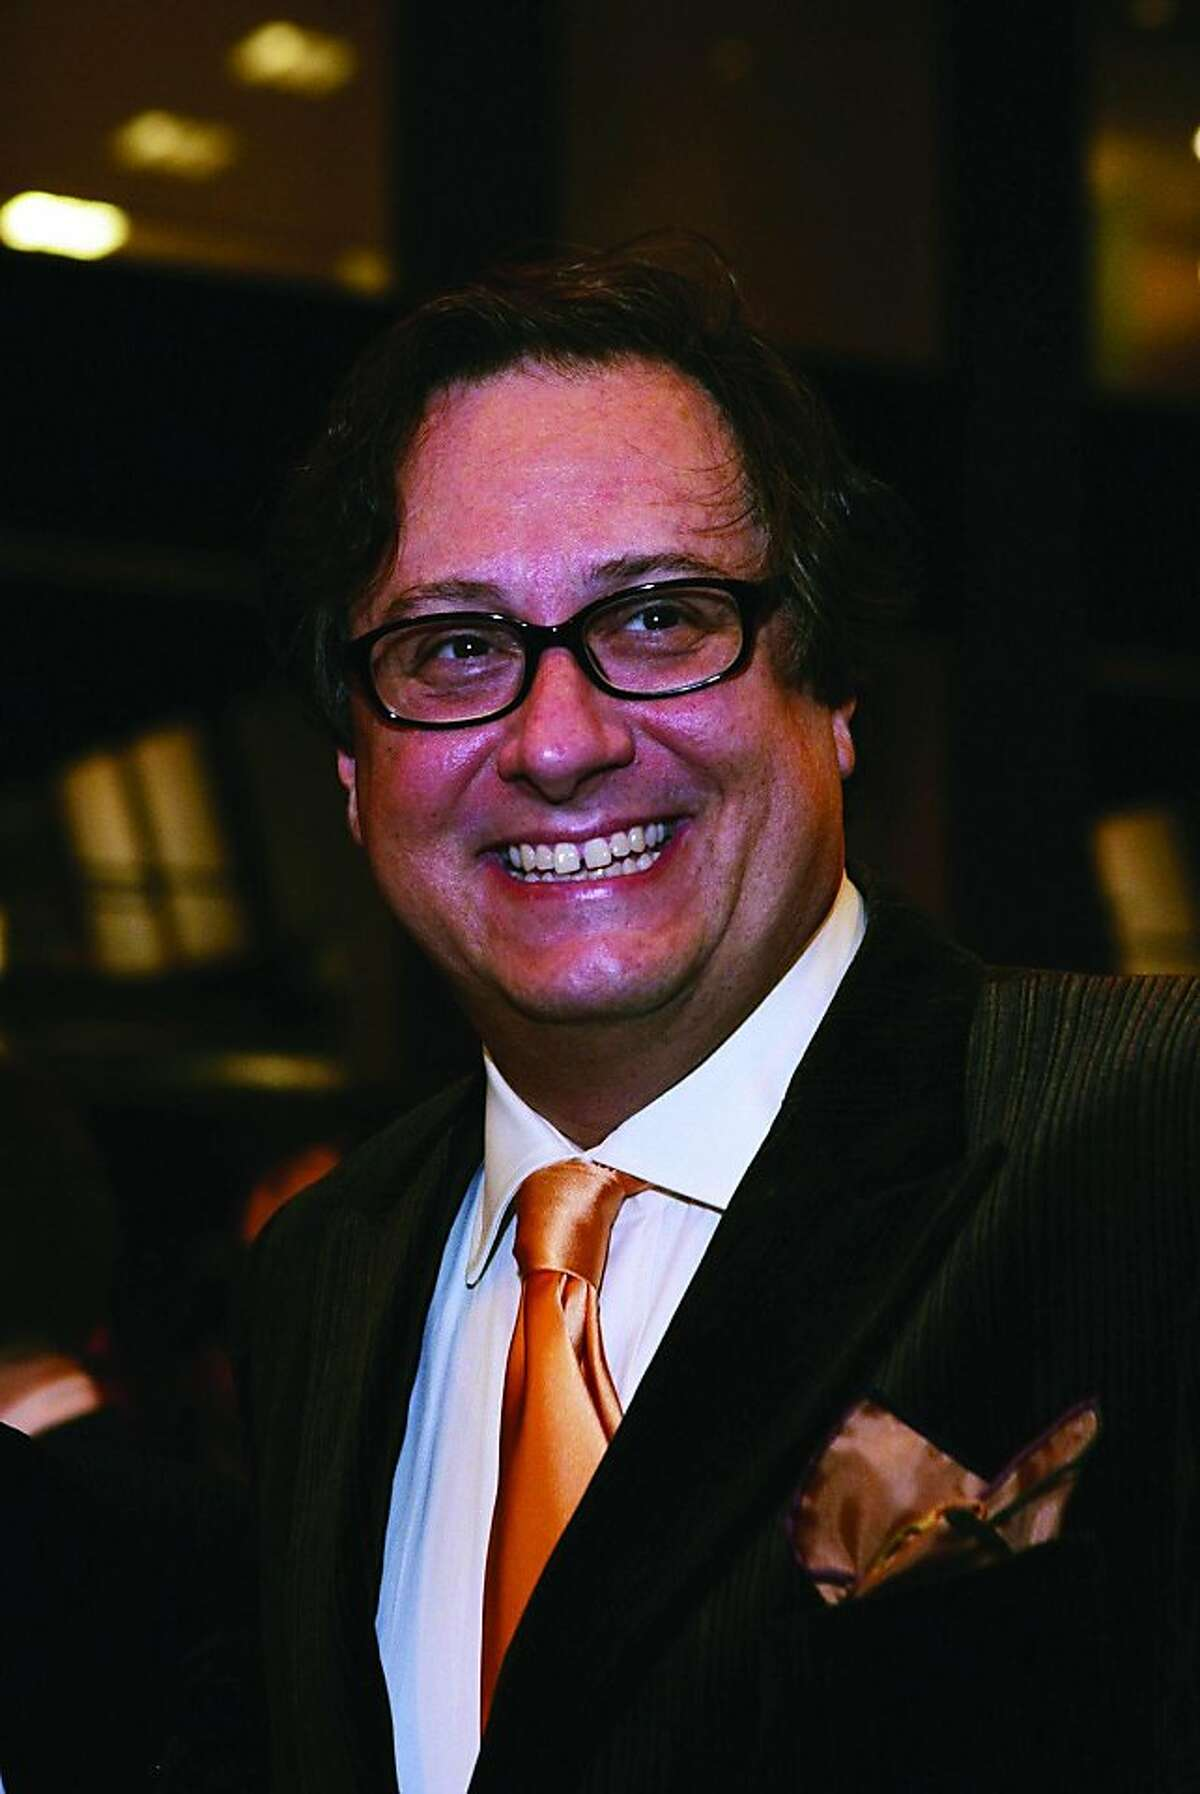 Douglas Carter Beane: Tony-nominated writer Douglas Carter Beane adapted the 1980 movie